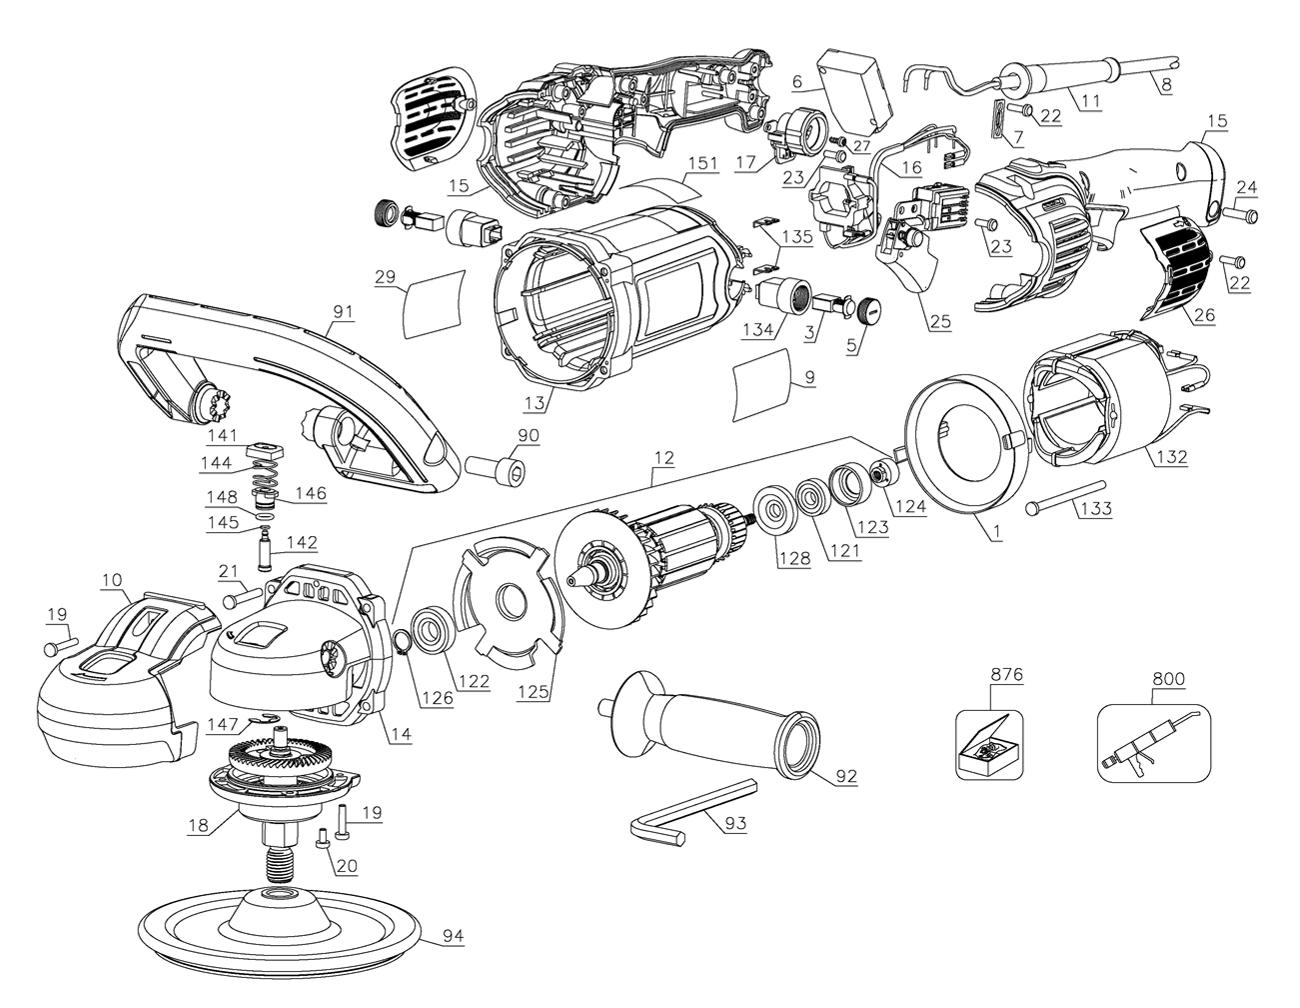 Dewalt Dwp849x B3 Type 1 Parts List